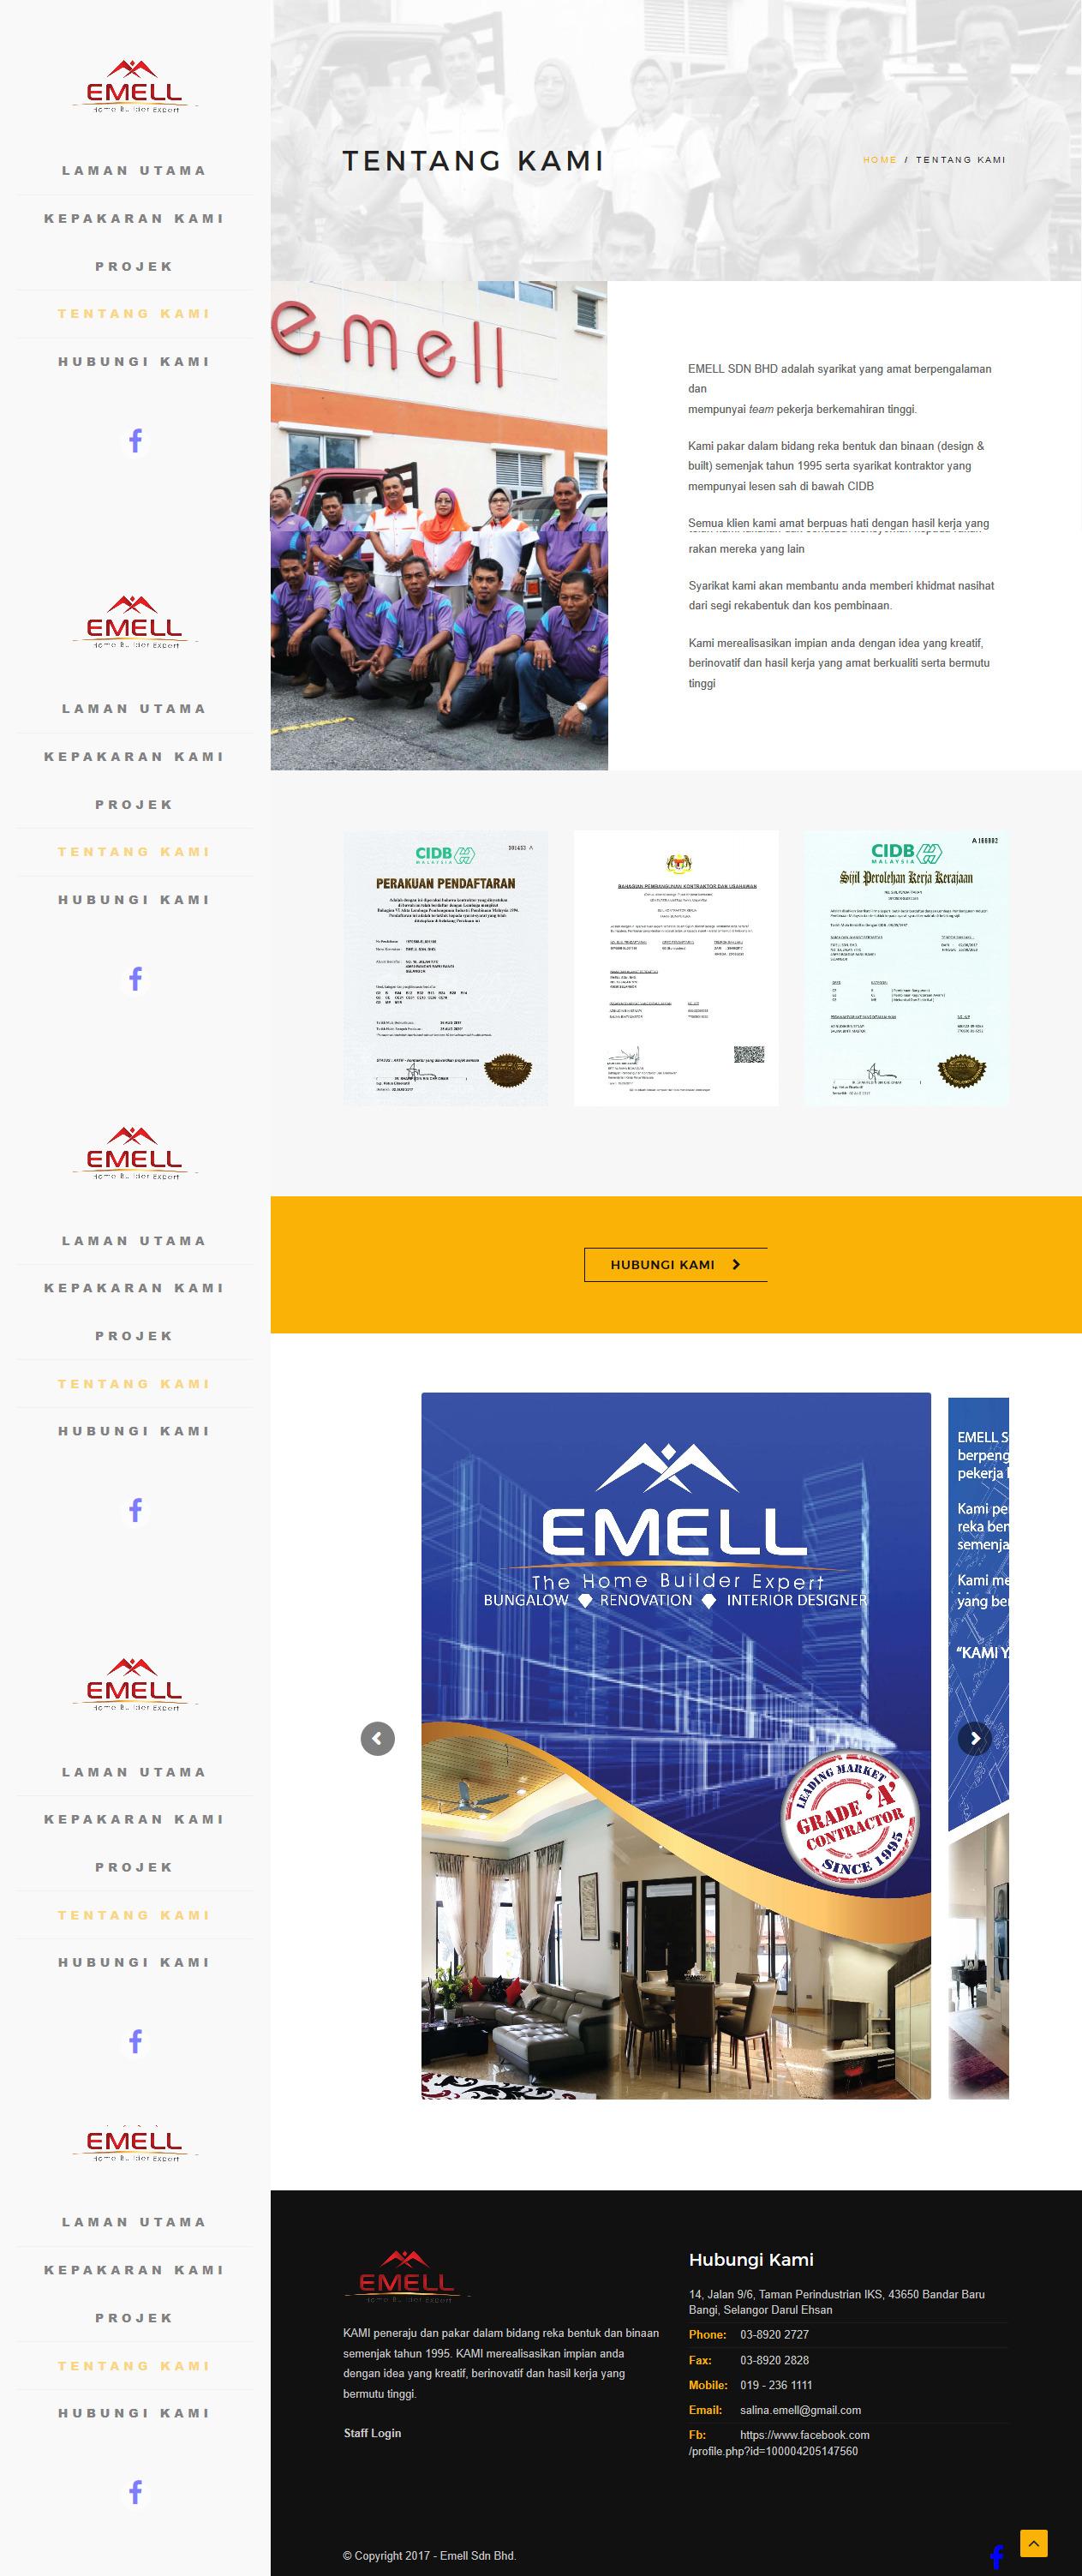 Emell.com.my